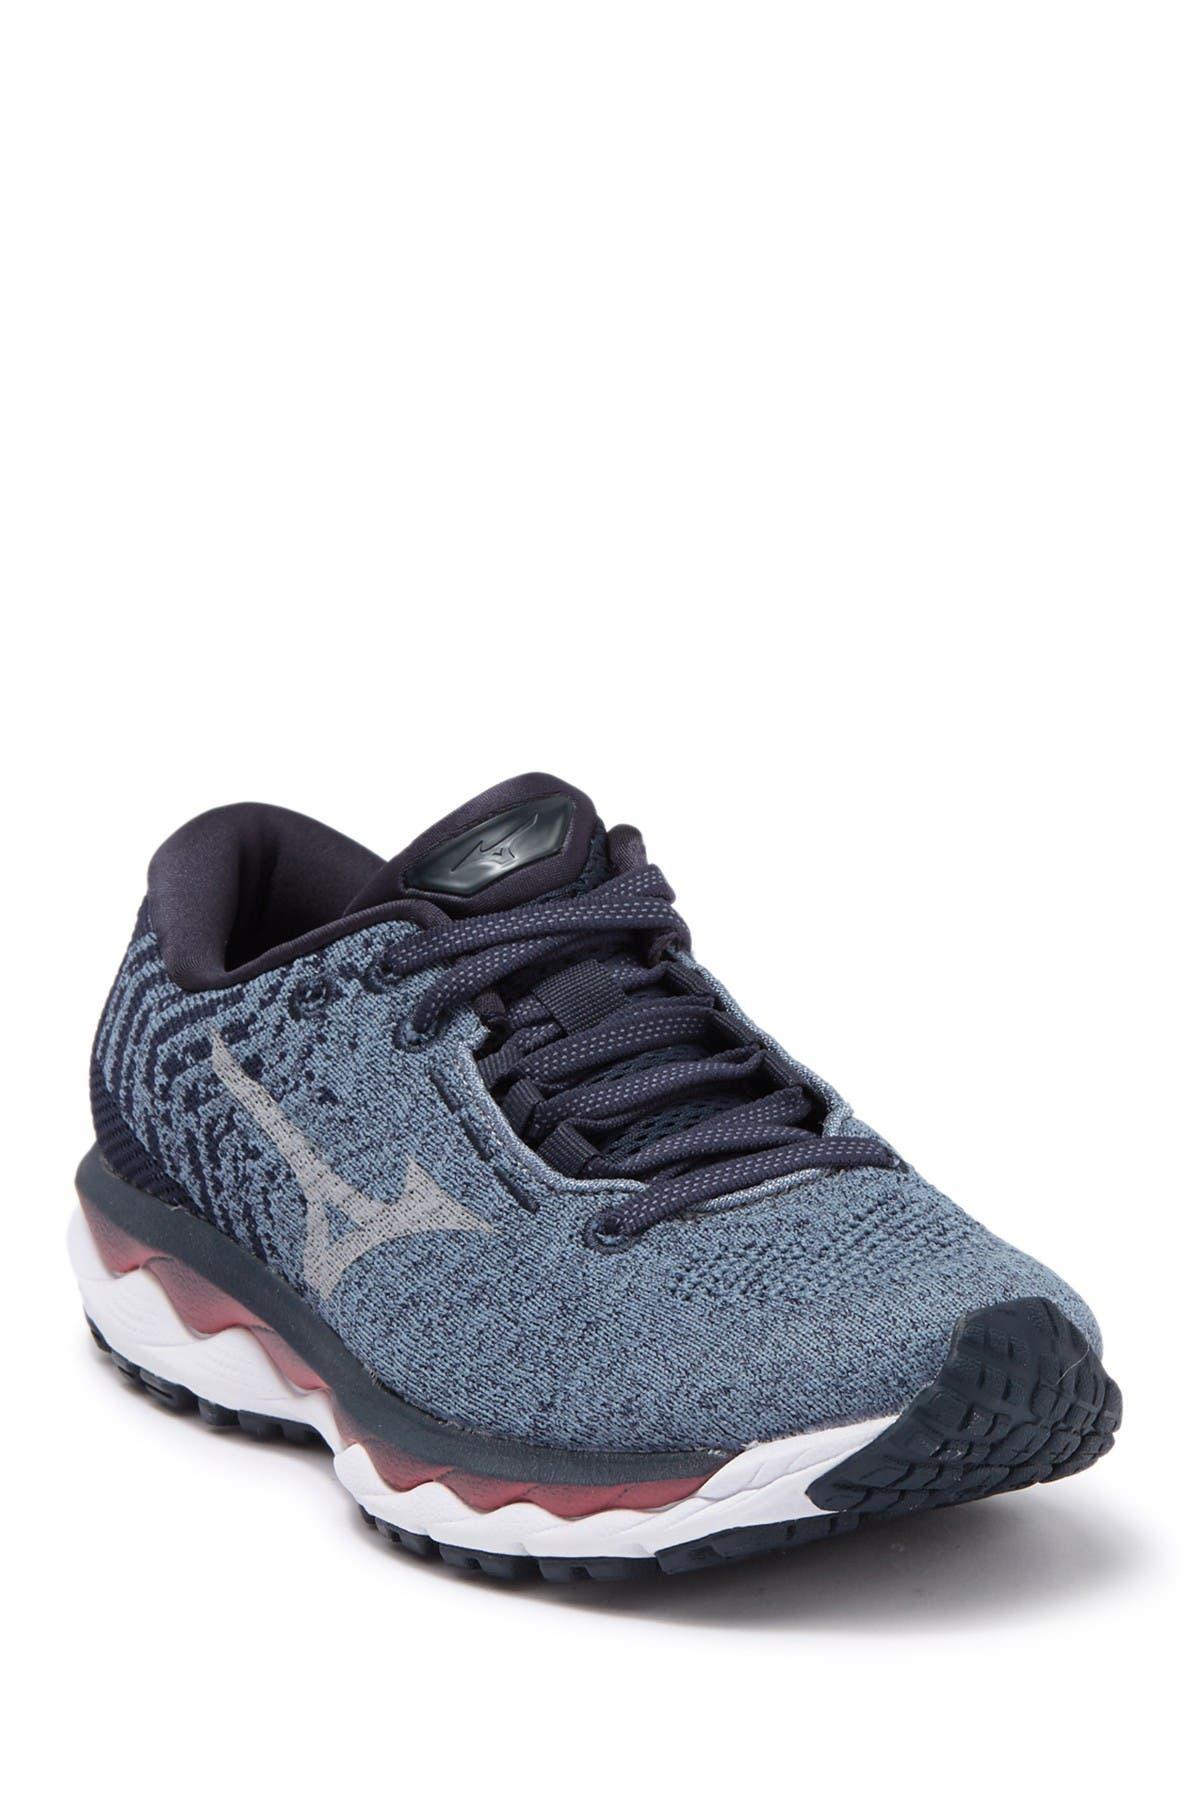 Image of Mizuno Wave Sky 3 Waveknit Running Sneaker